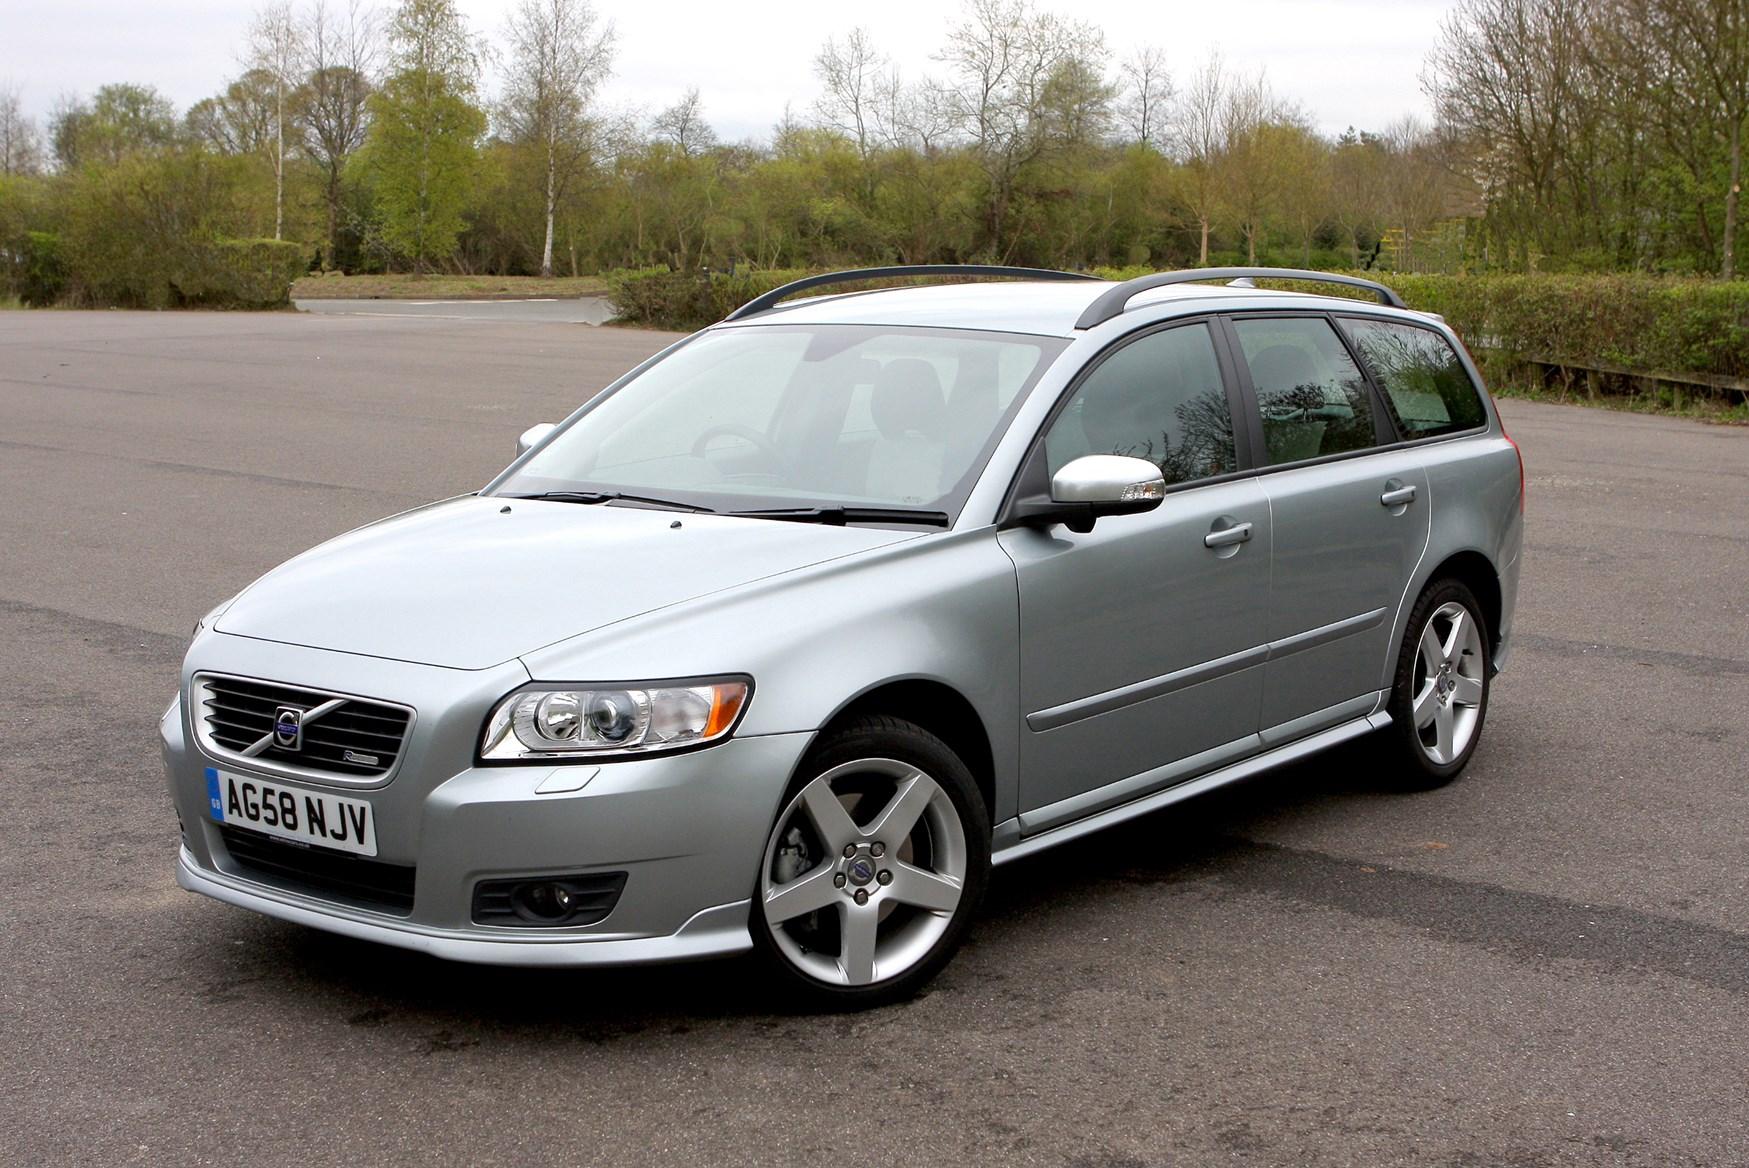 Used Volvo V50 Estate (2004 - 2012) Practicality | Parkers